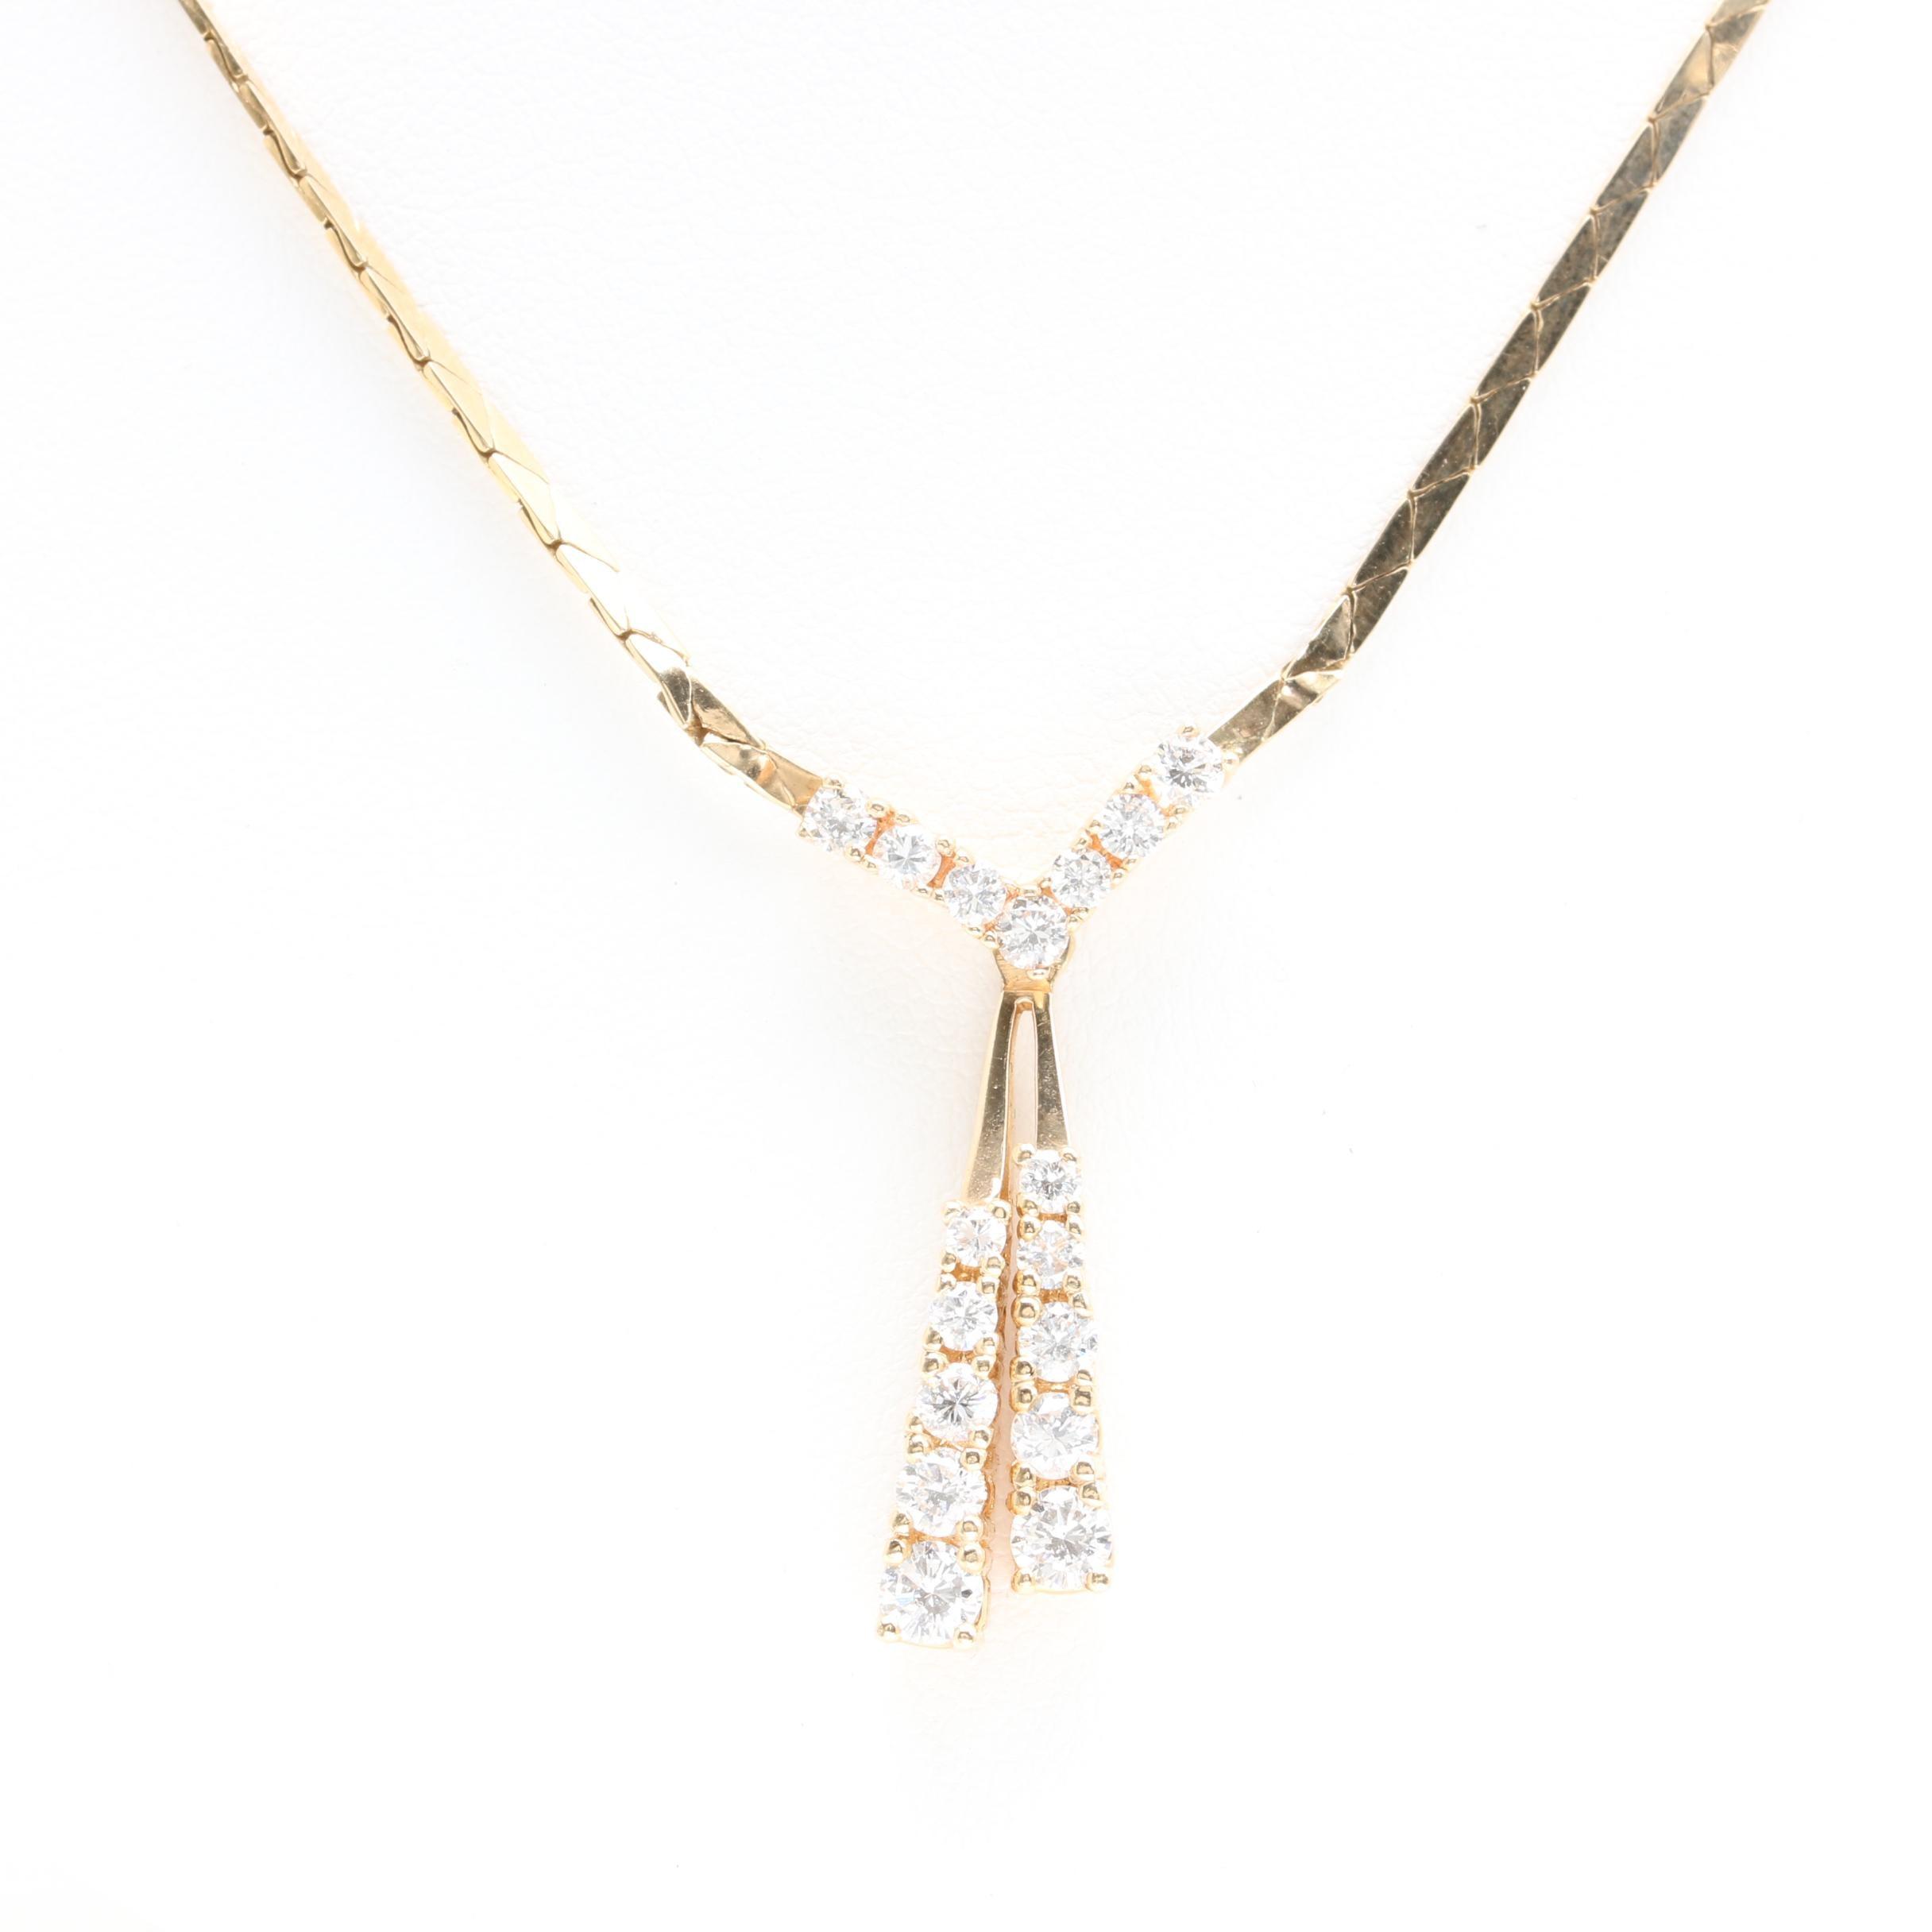 14K Yellow Gold 1.34 CTW Diamond Necklace